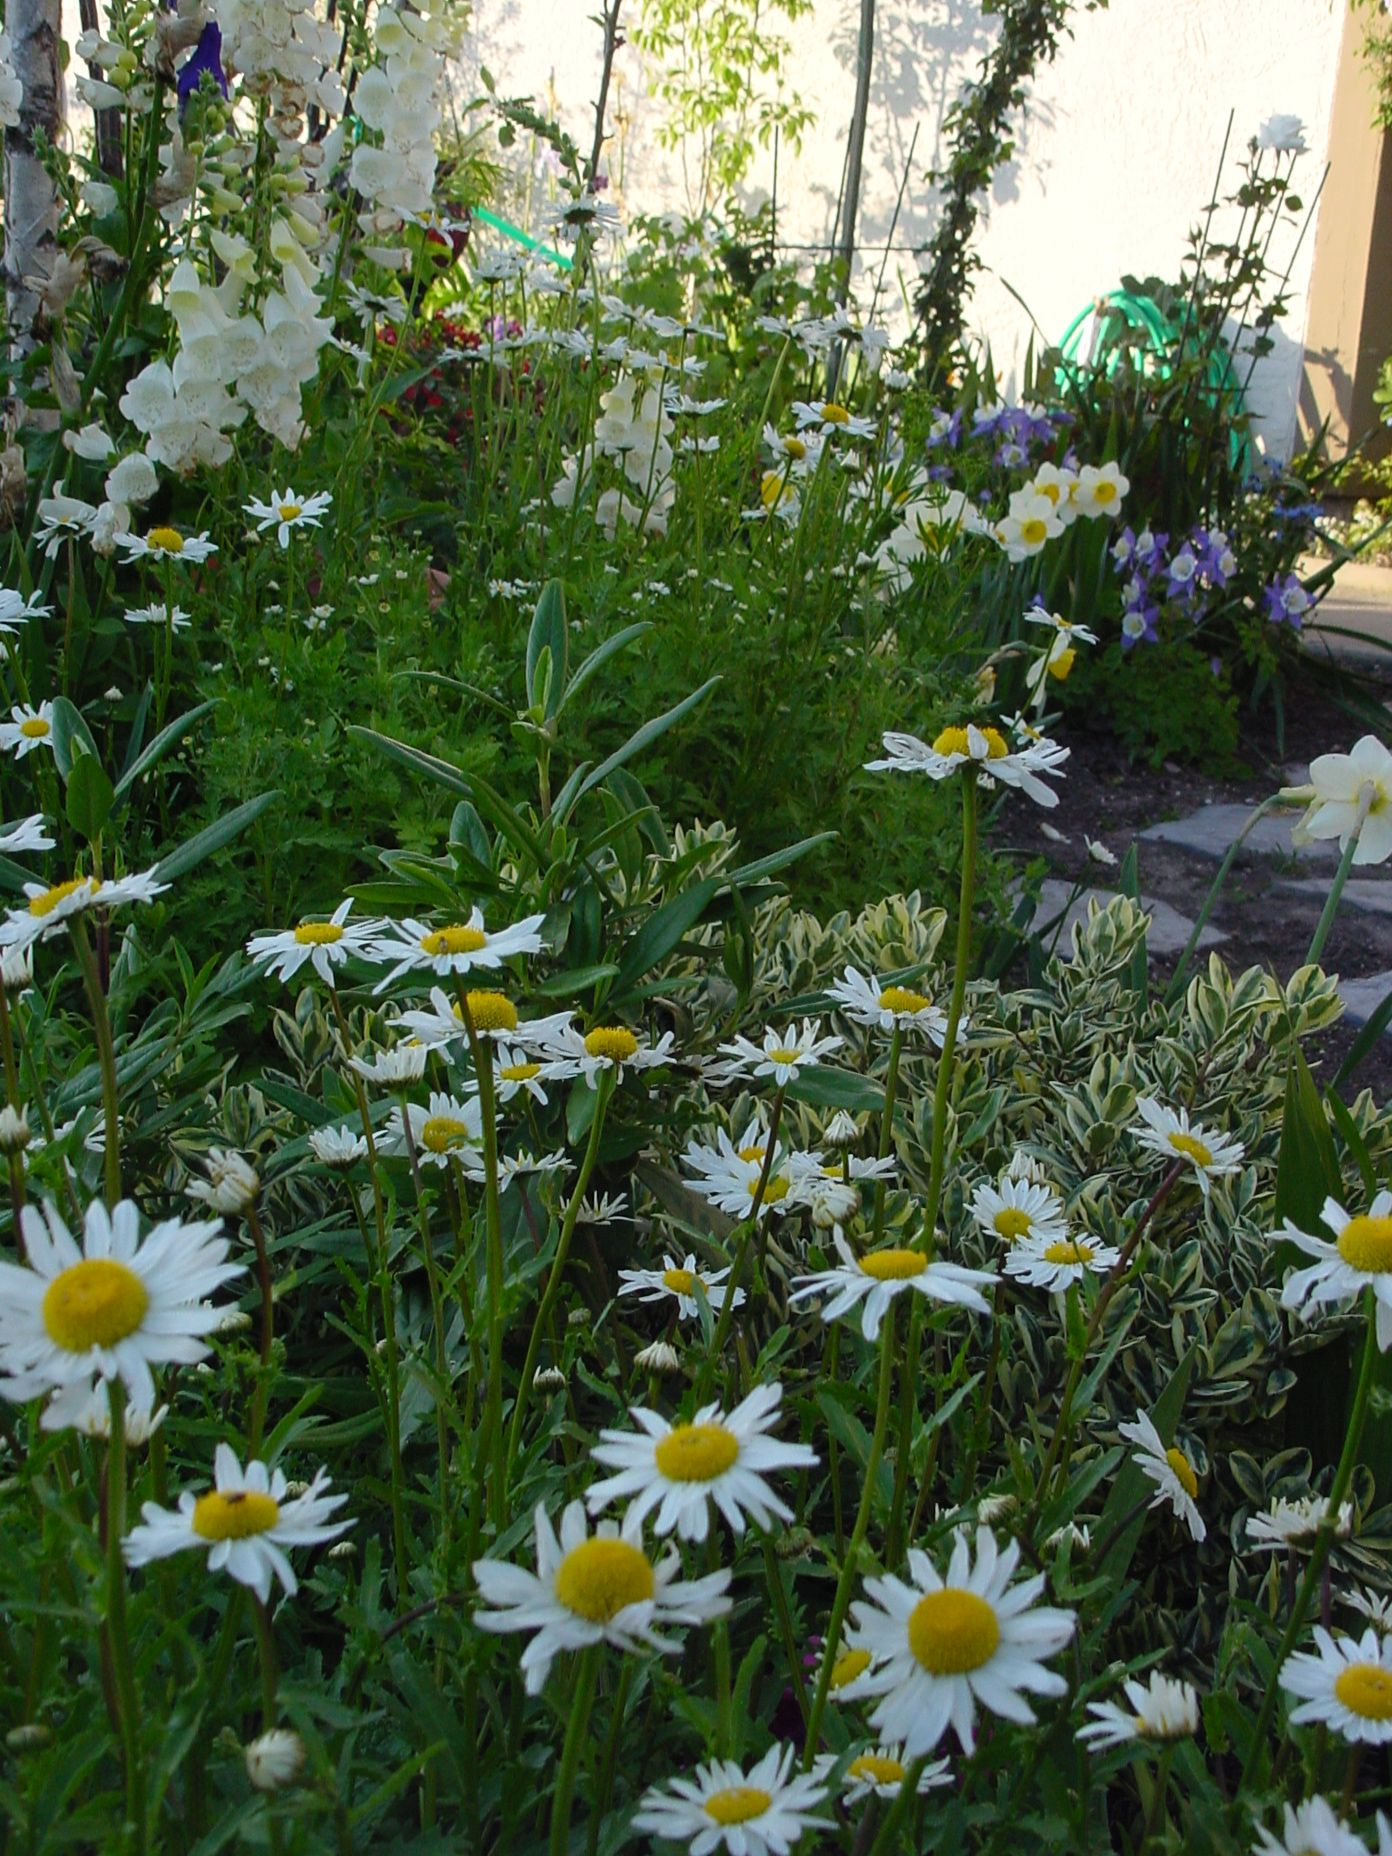 Front yard cottage gardens - My Small Front Yard Cottage Garden